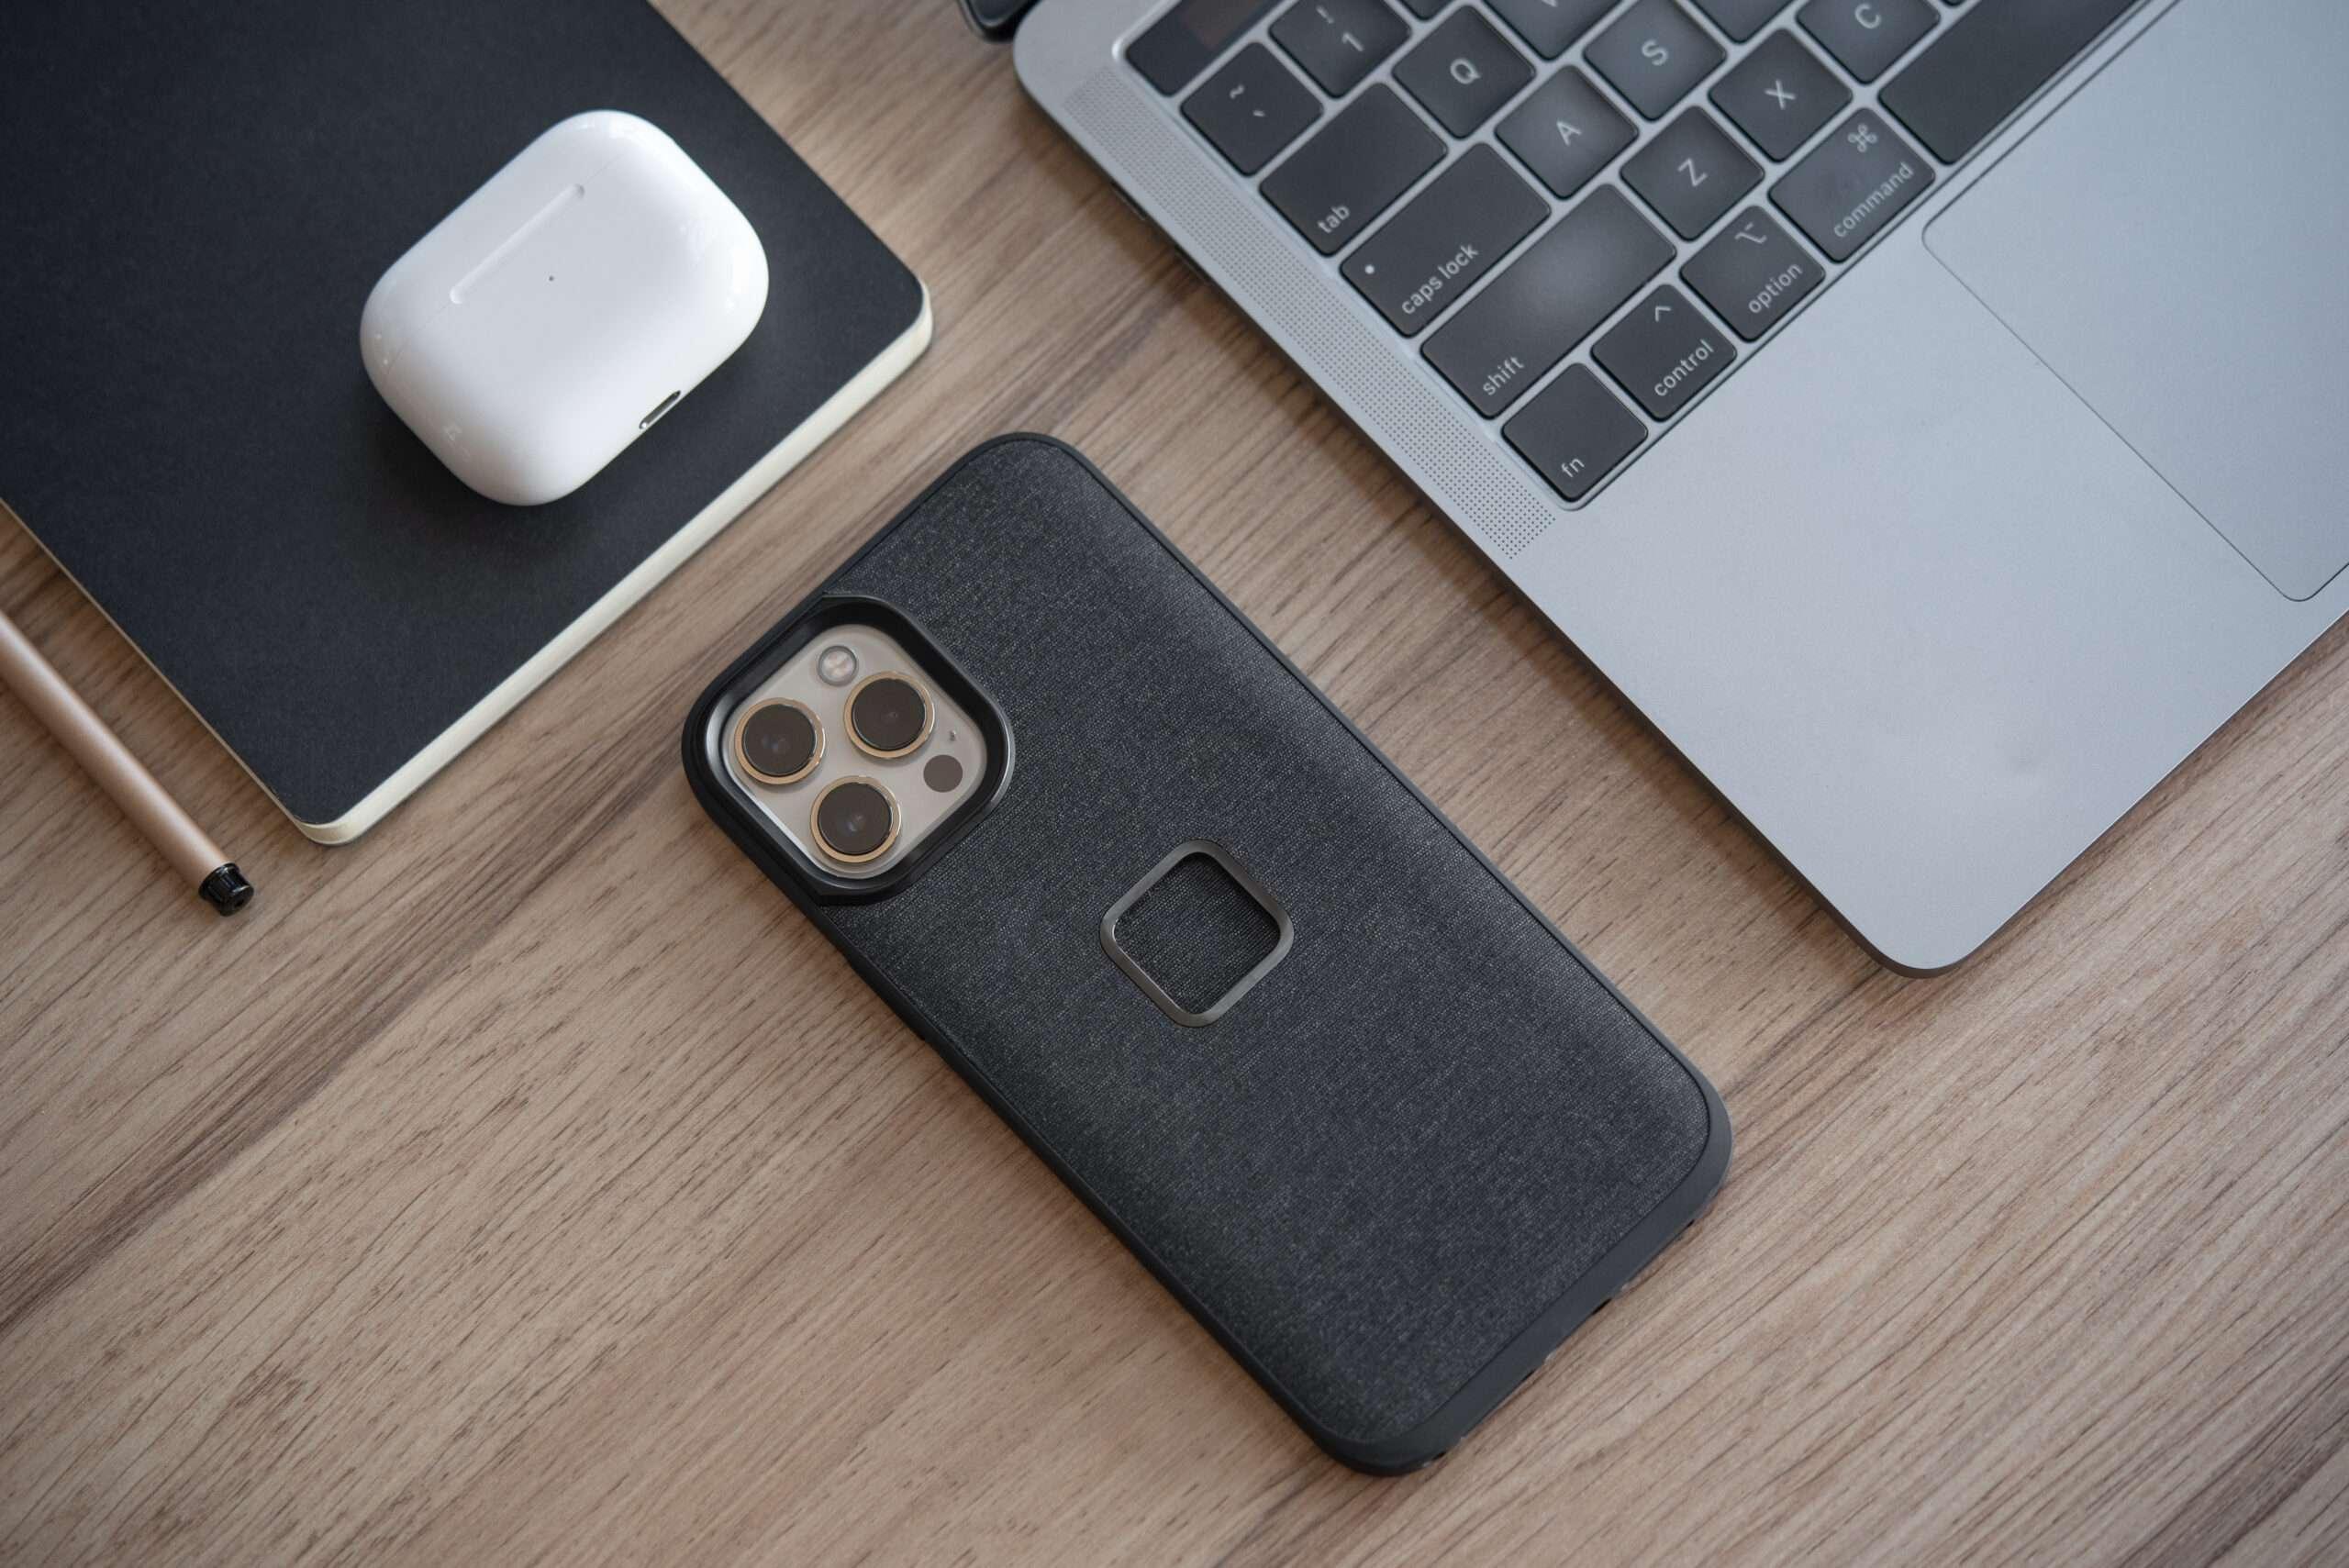 Peak Design Mobile Everyday Smartphone Case with Loop